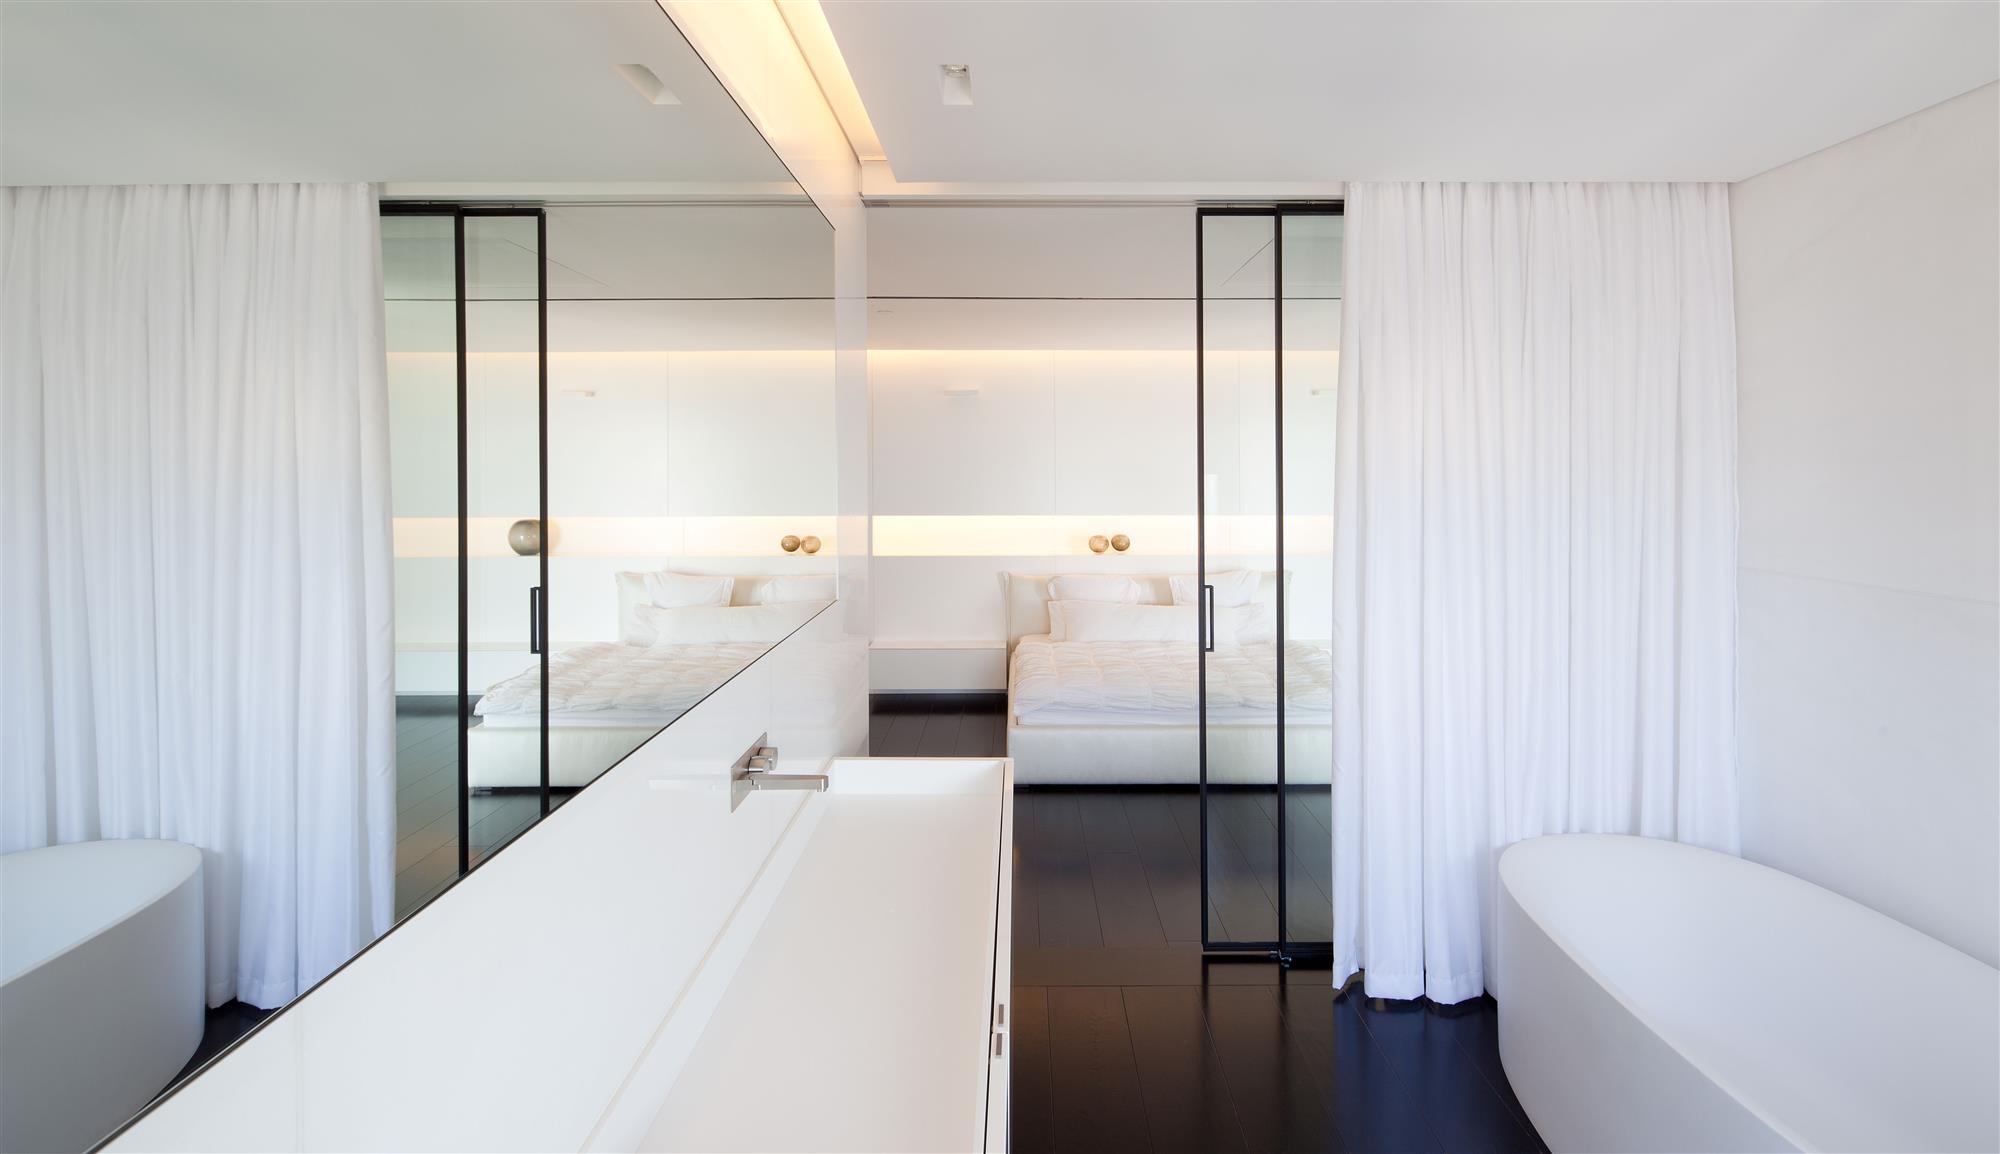 Moderne Strakke Slaapkamer : Moderne strakke slaapkamer door pitsou kedem architecten